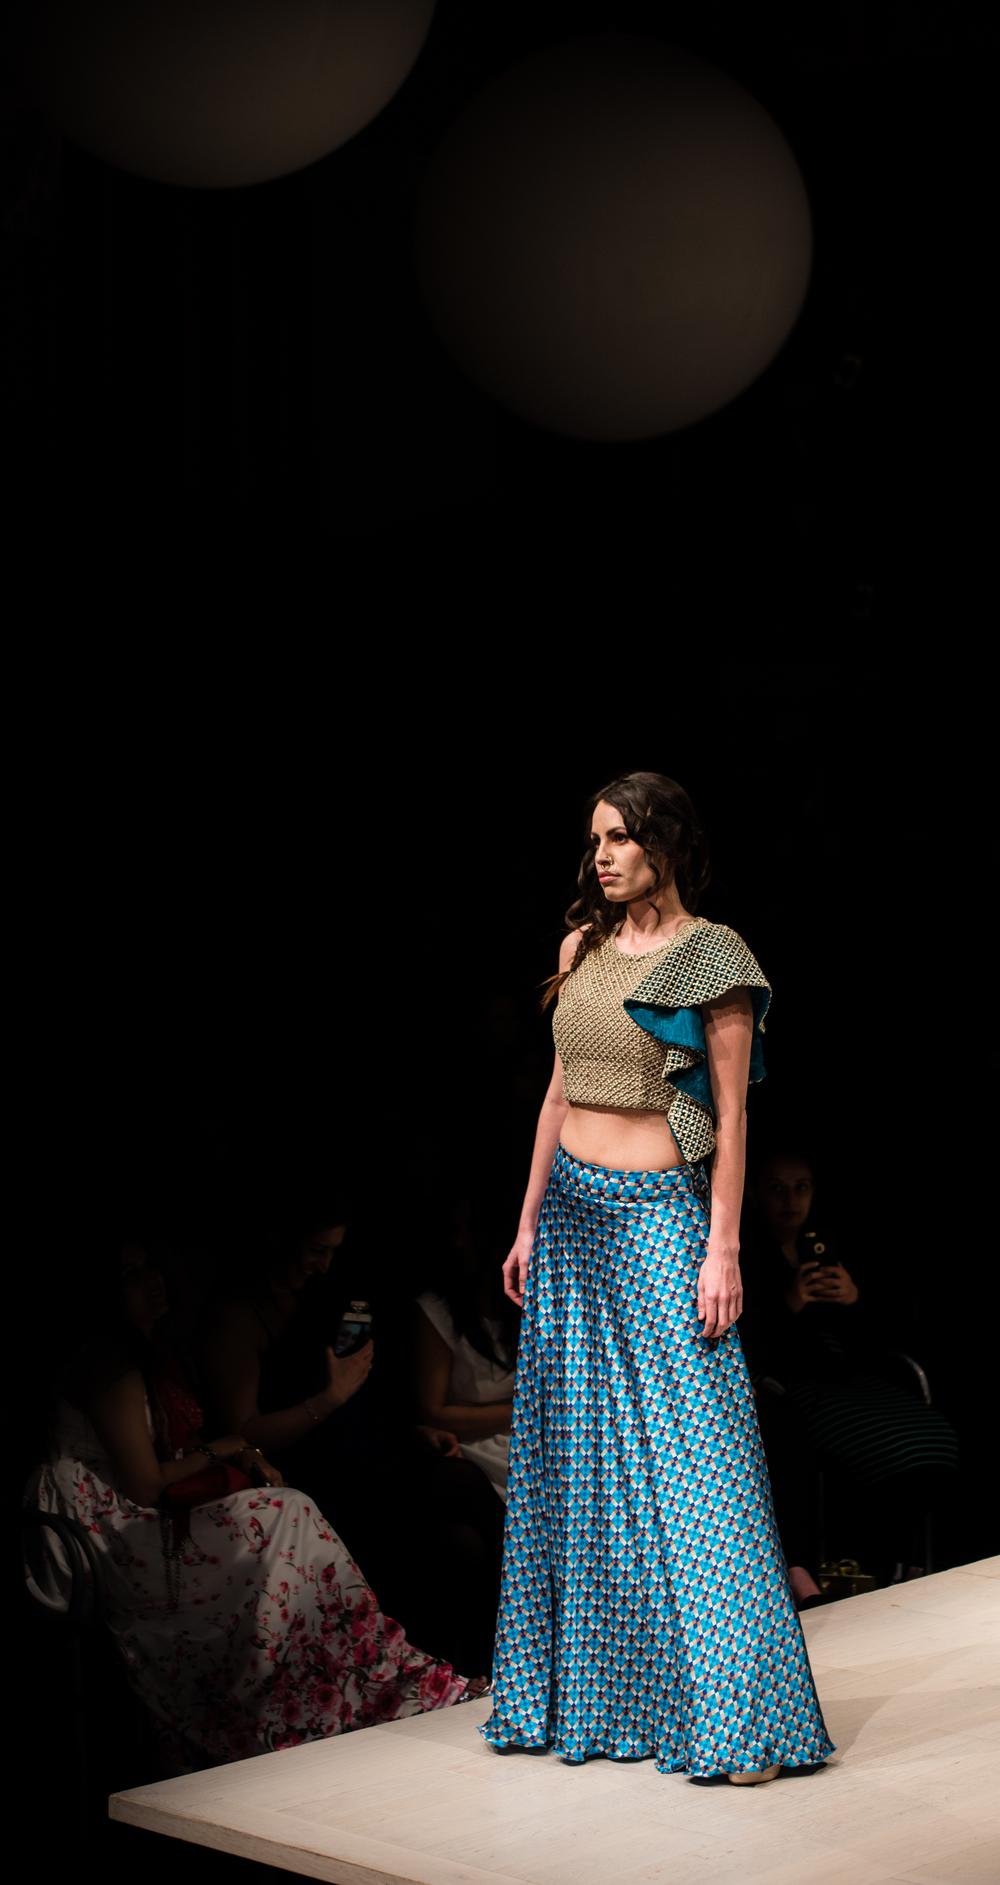 Sher Khan Niazi-WCFW-Designerz Den-3407.jpg